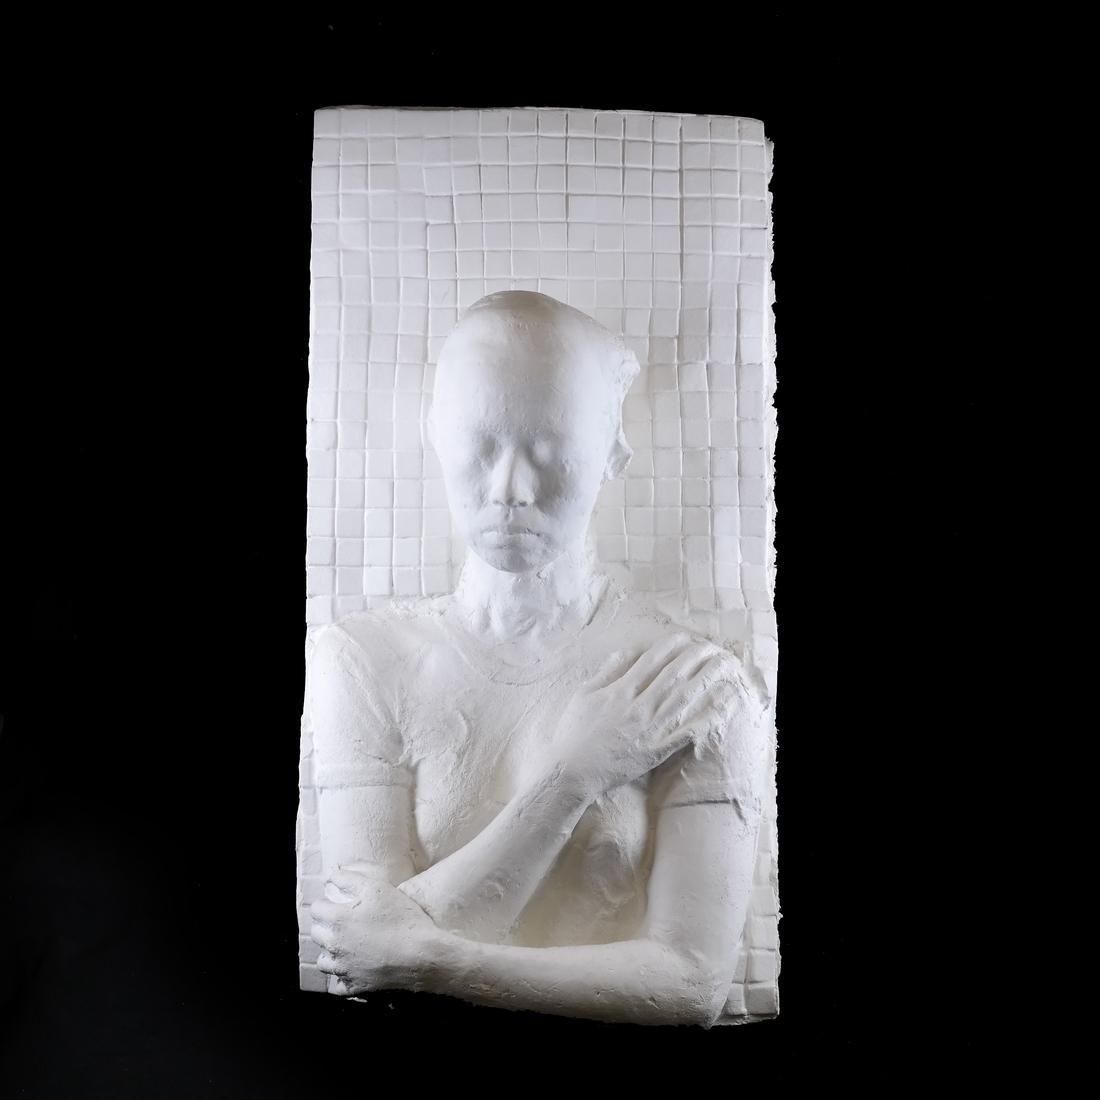 George Segal, Woman, Sculpture